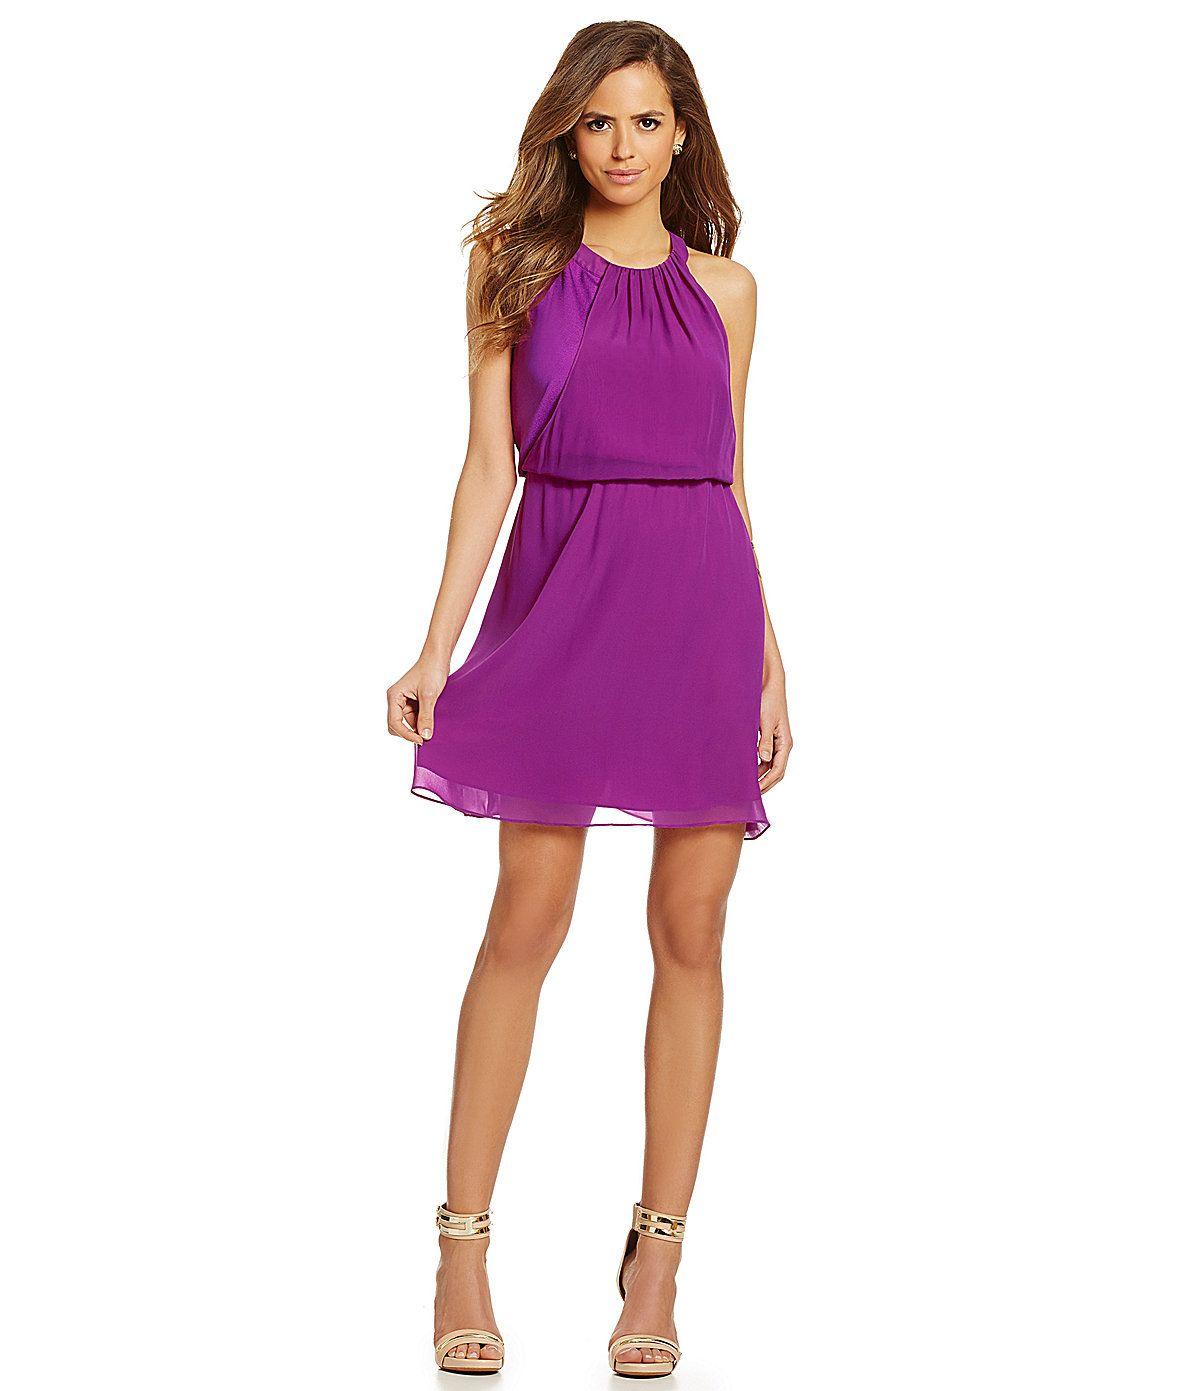 Gianni Bini Fan Fav Isabella Dress | Dillards.com | 2nd Invite ...